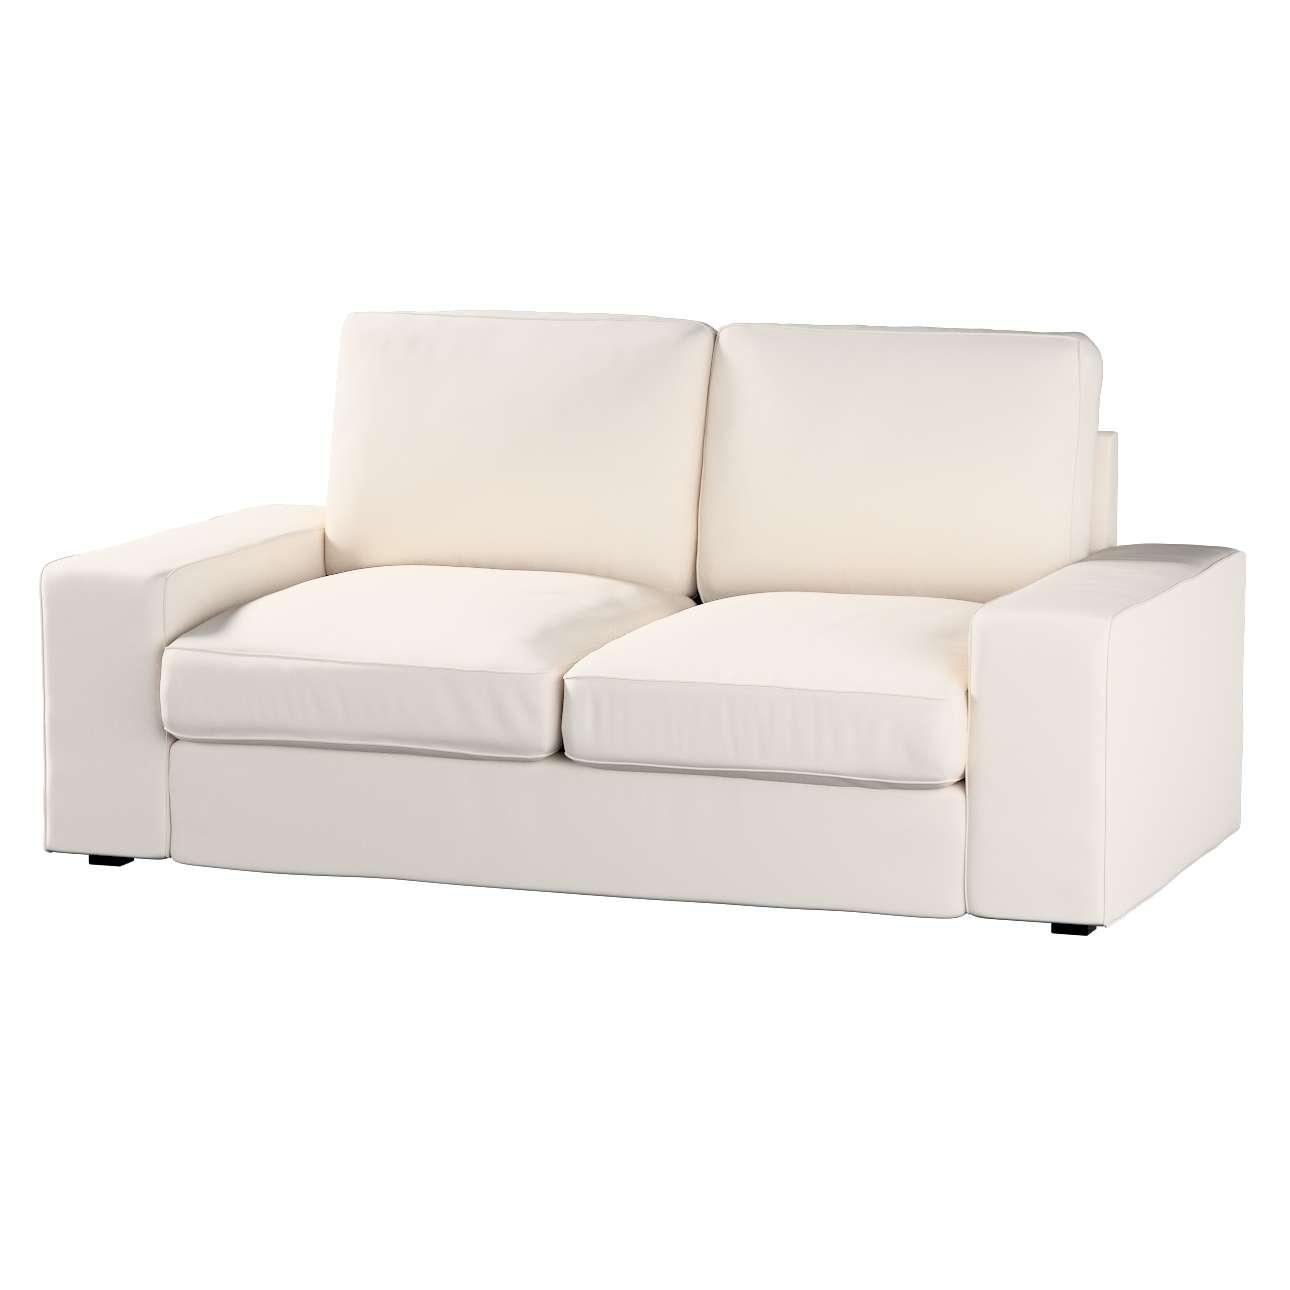 ikea kivik sofa covers. Black Bedroom Furniture Sets. Home Design Ideas